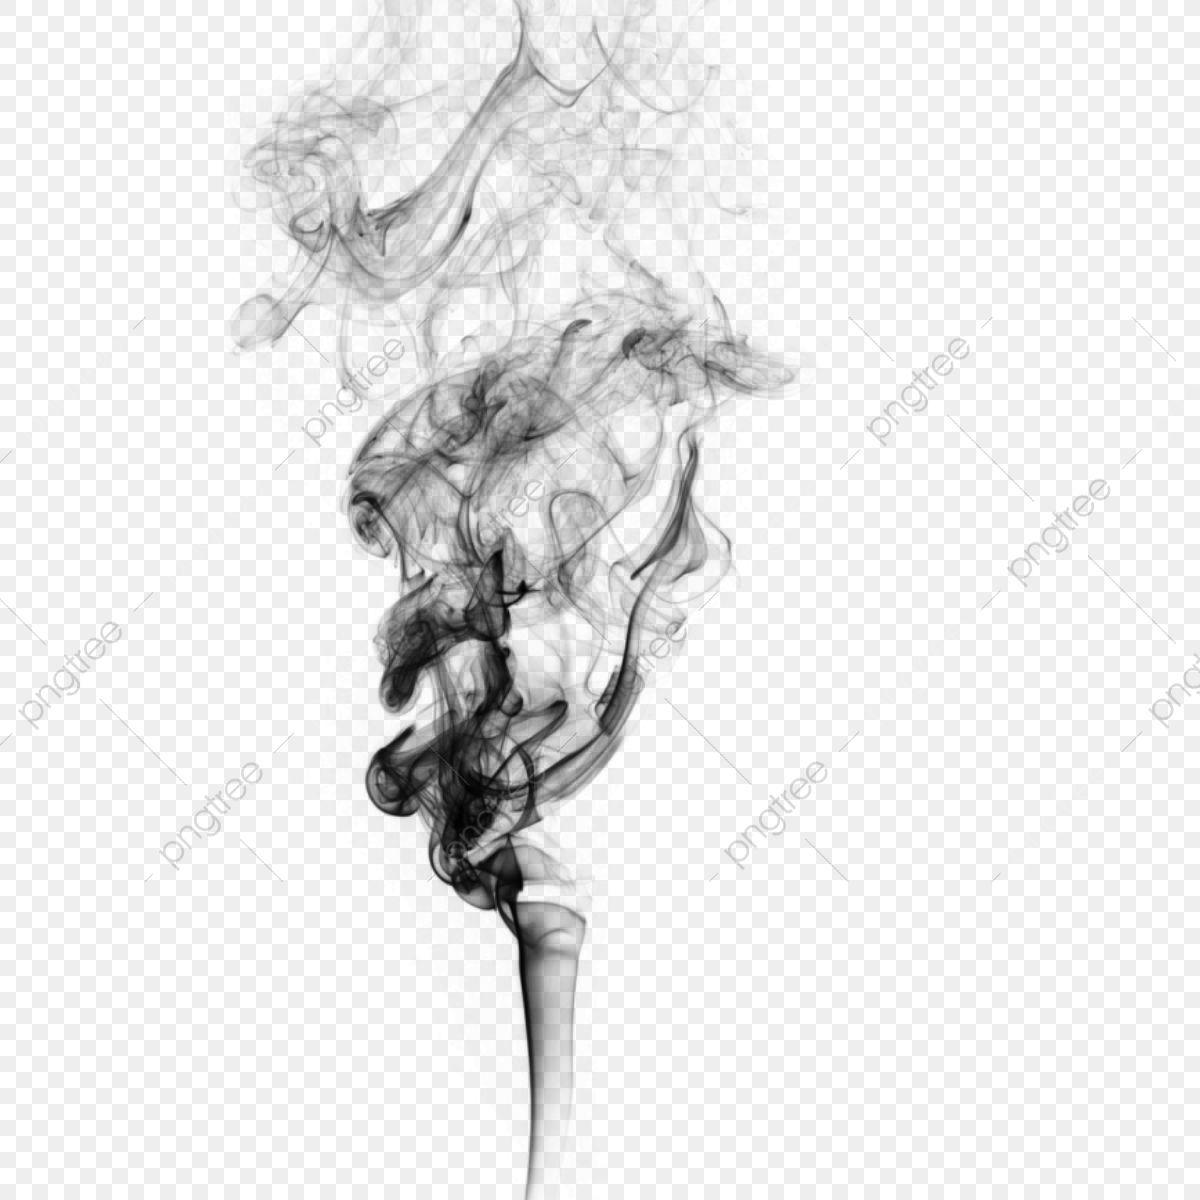 Smoke Vector Illustration Design Art Art Icons Smoke Icons Smoke Png Transparent Clipart Image And Psd File For Free Download Diseno De Ilustracion Fondos De Humo Disenos Creativos